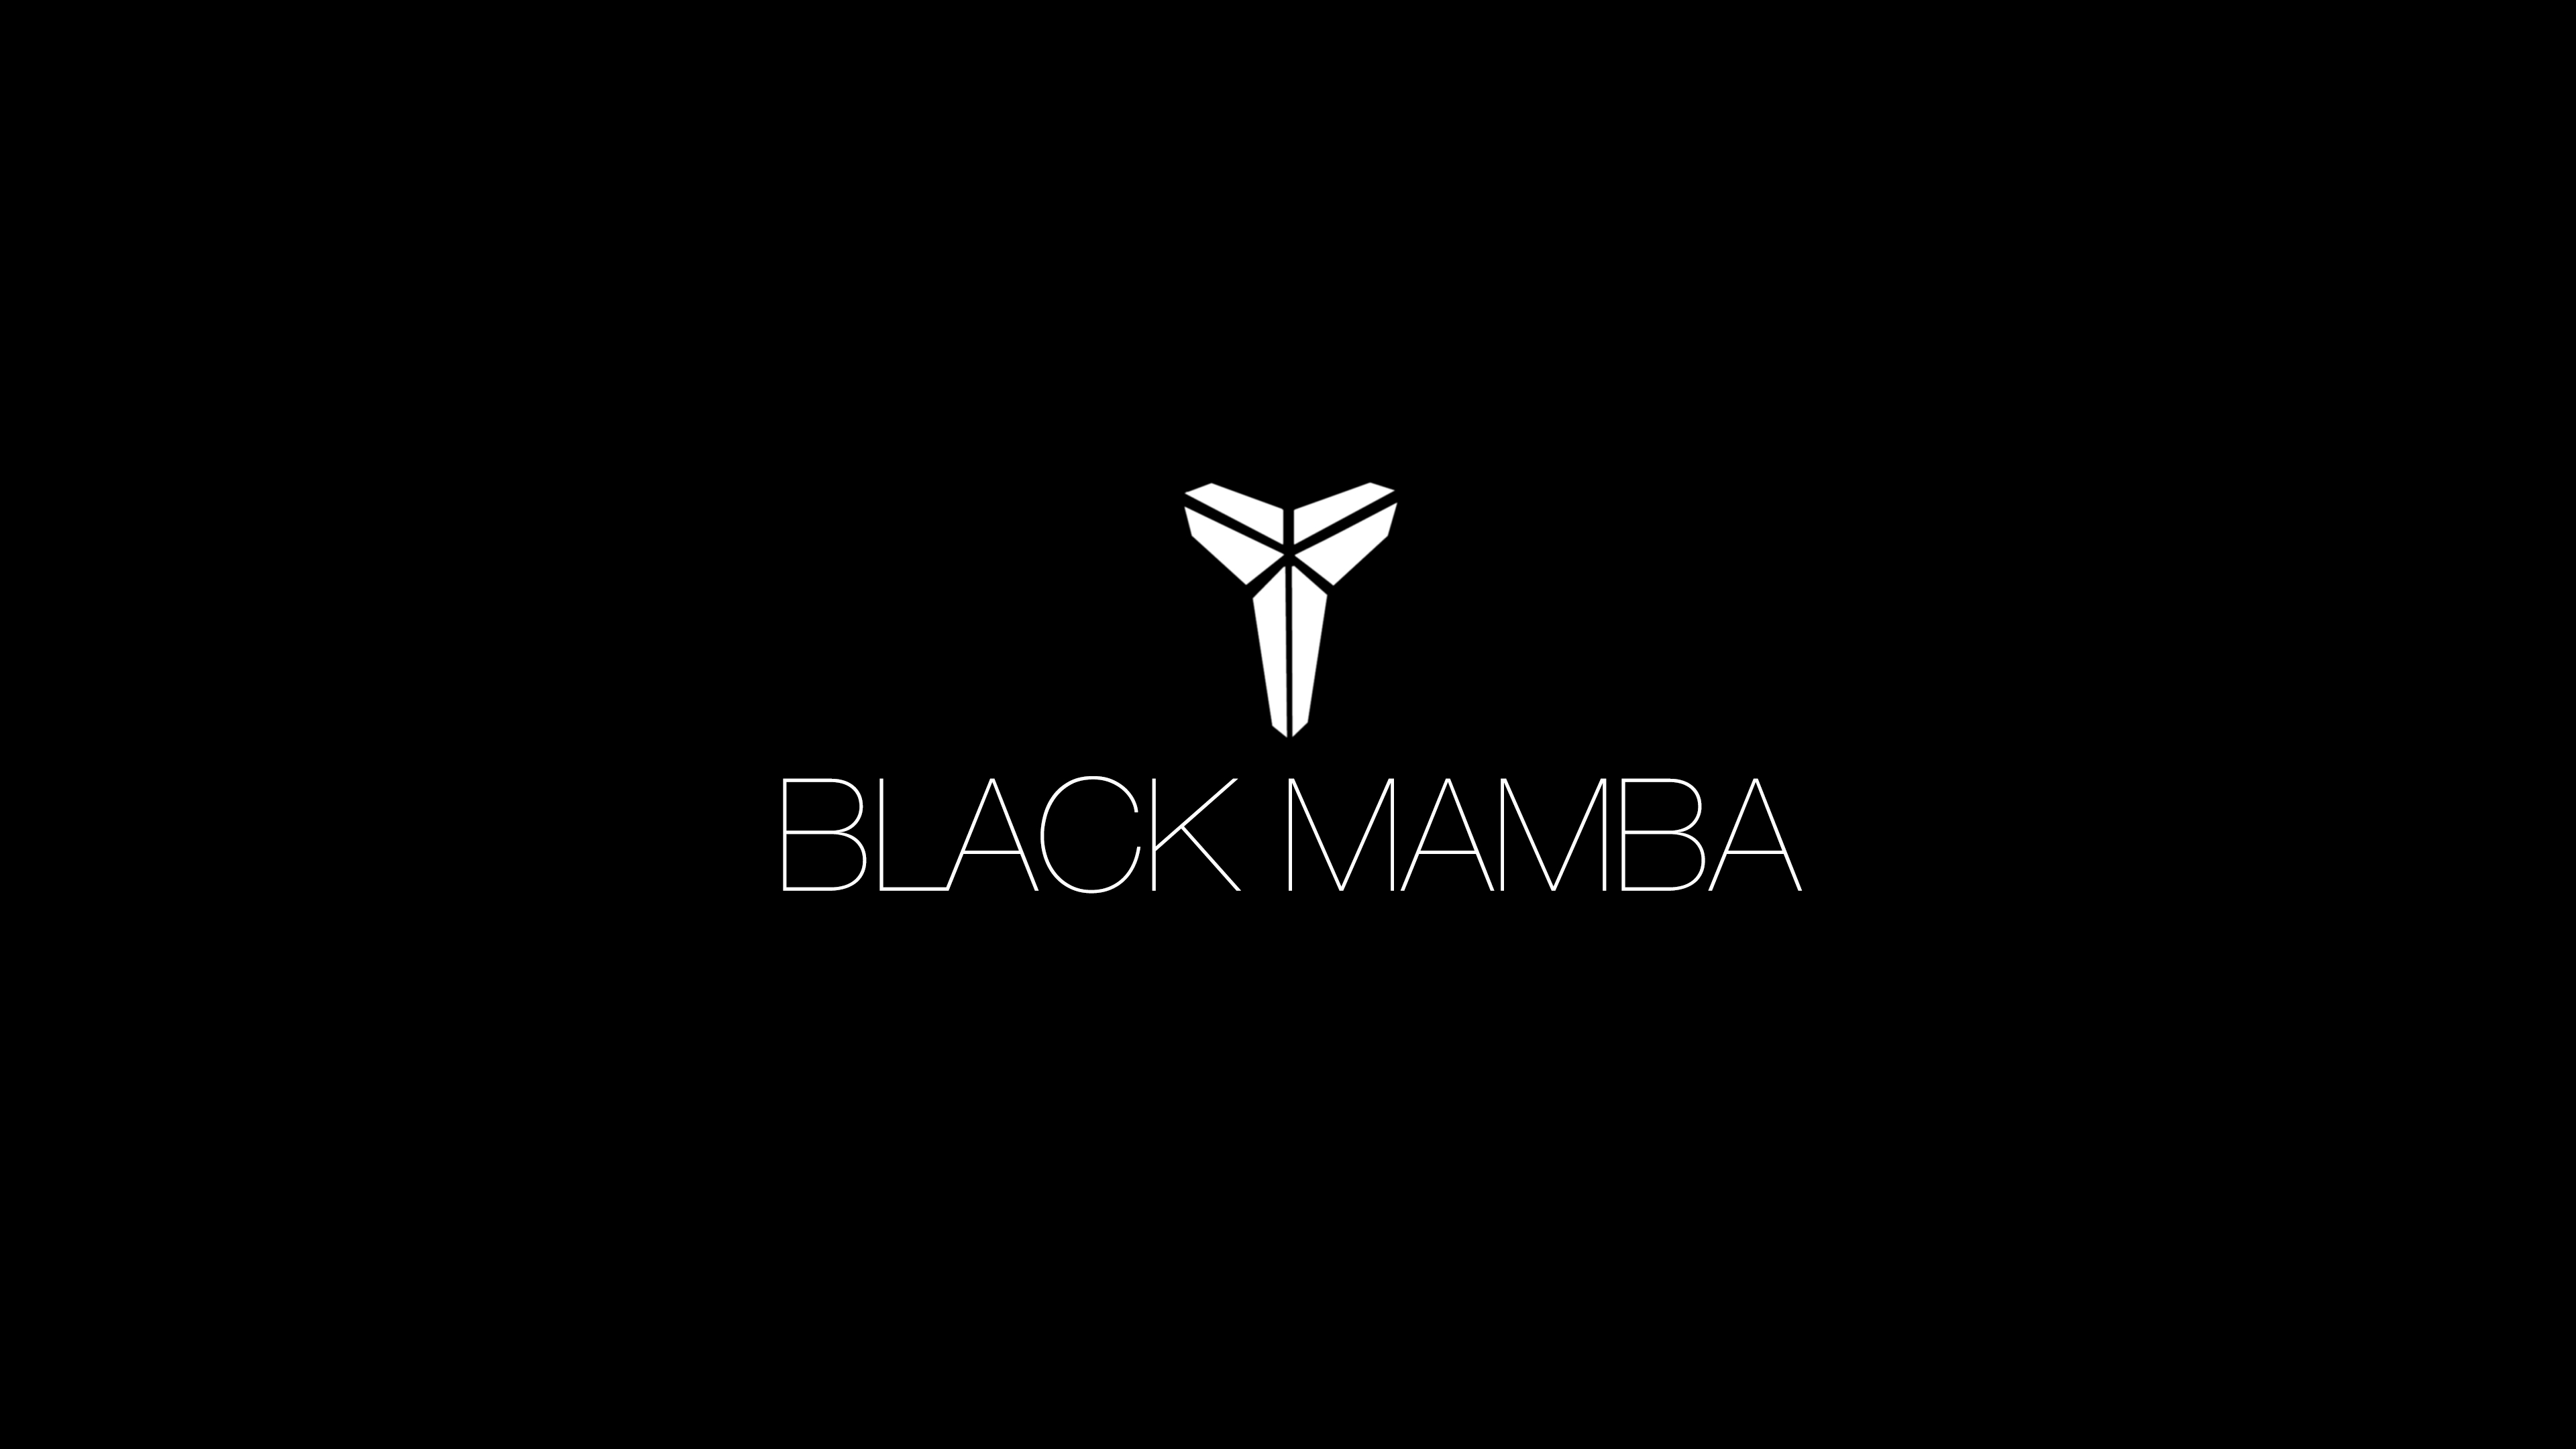 1999 black mamba kobe wallpaper